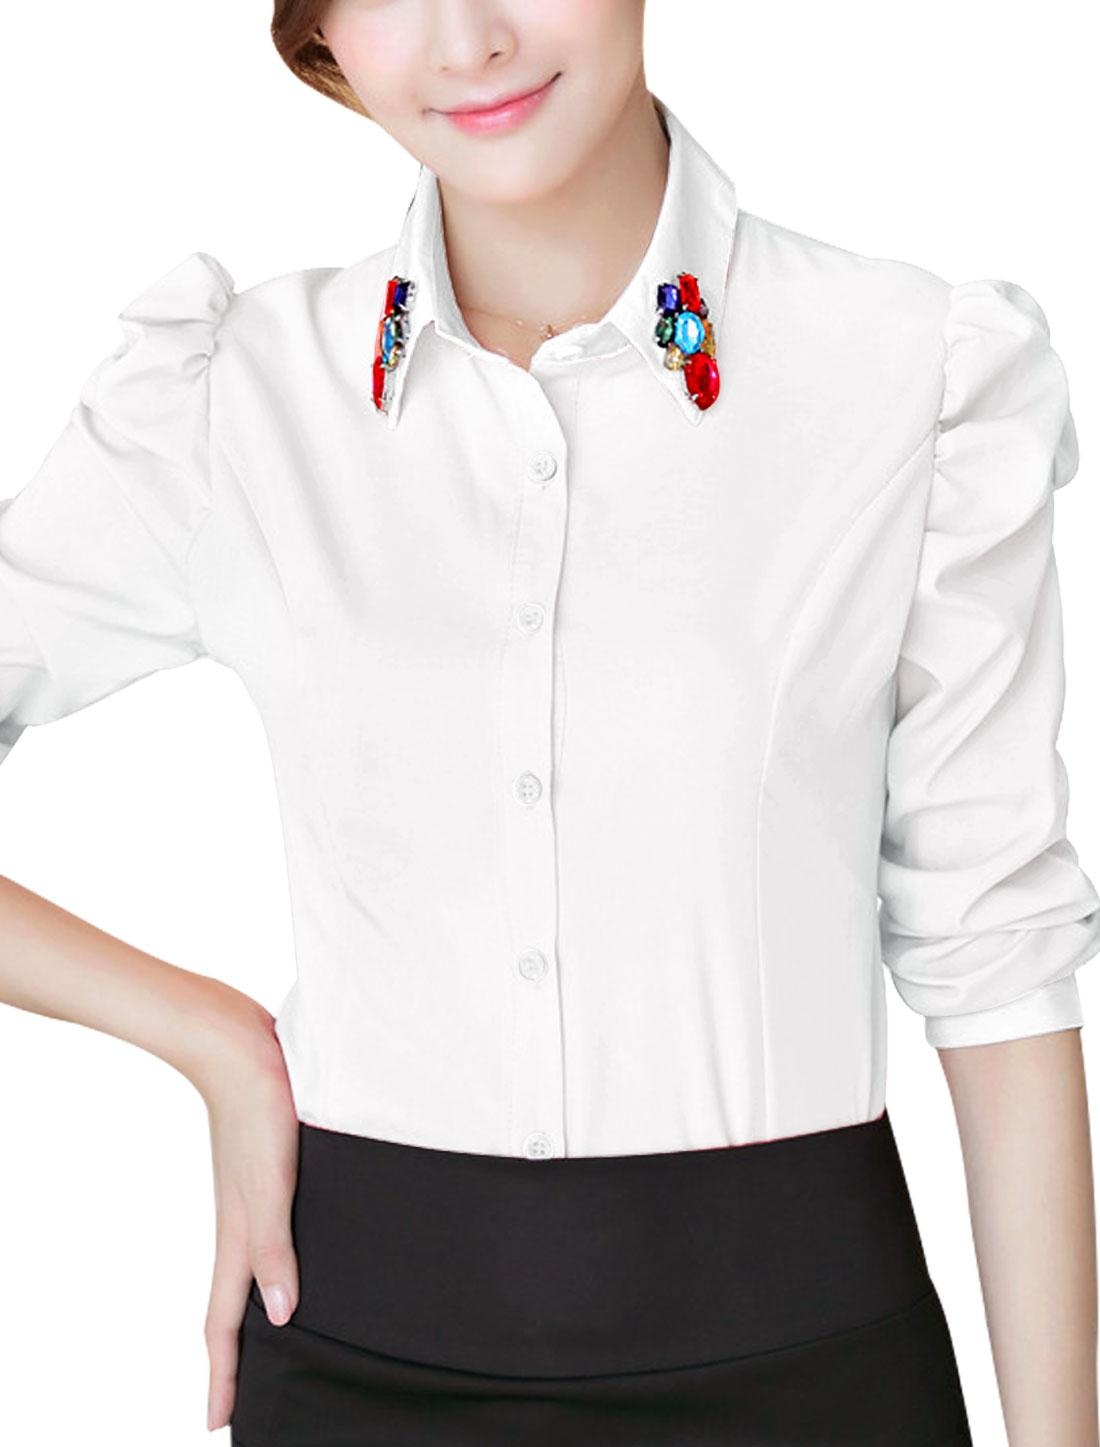 Women Rhinestones Embellished Puff Sleeve Single Breasted Shirt White L